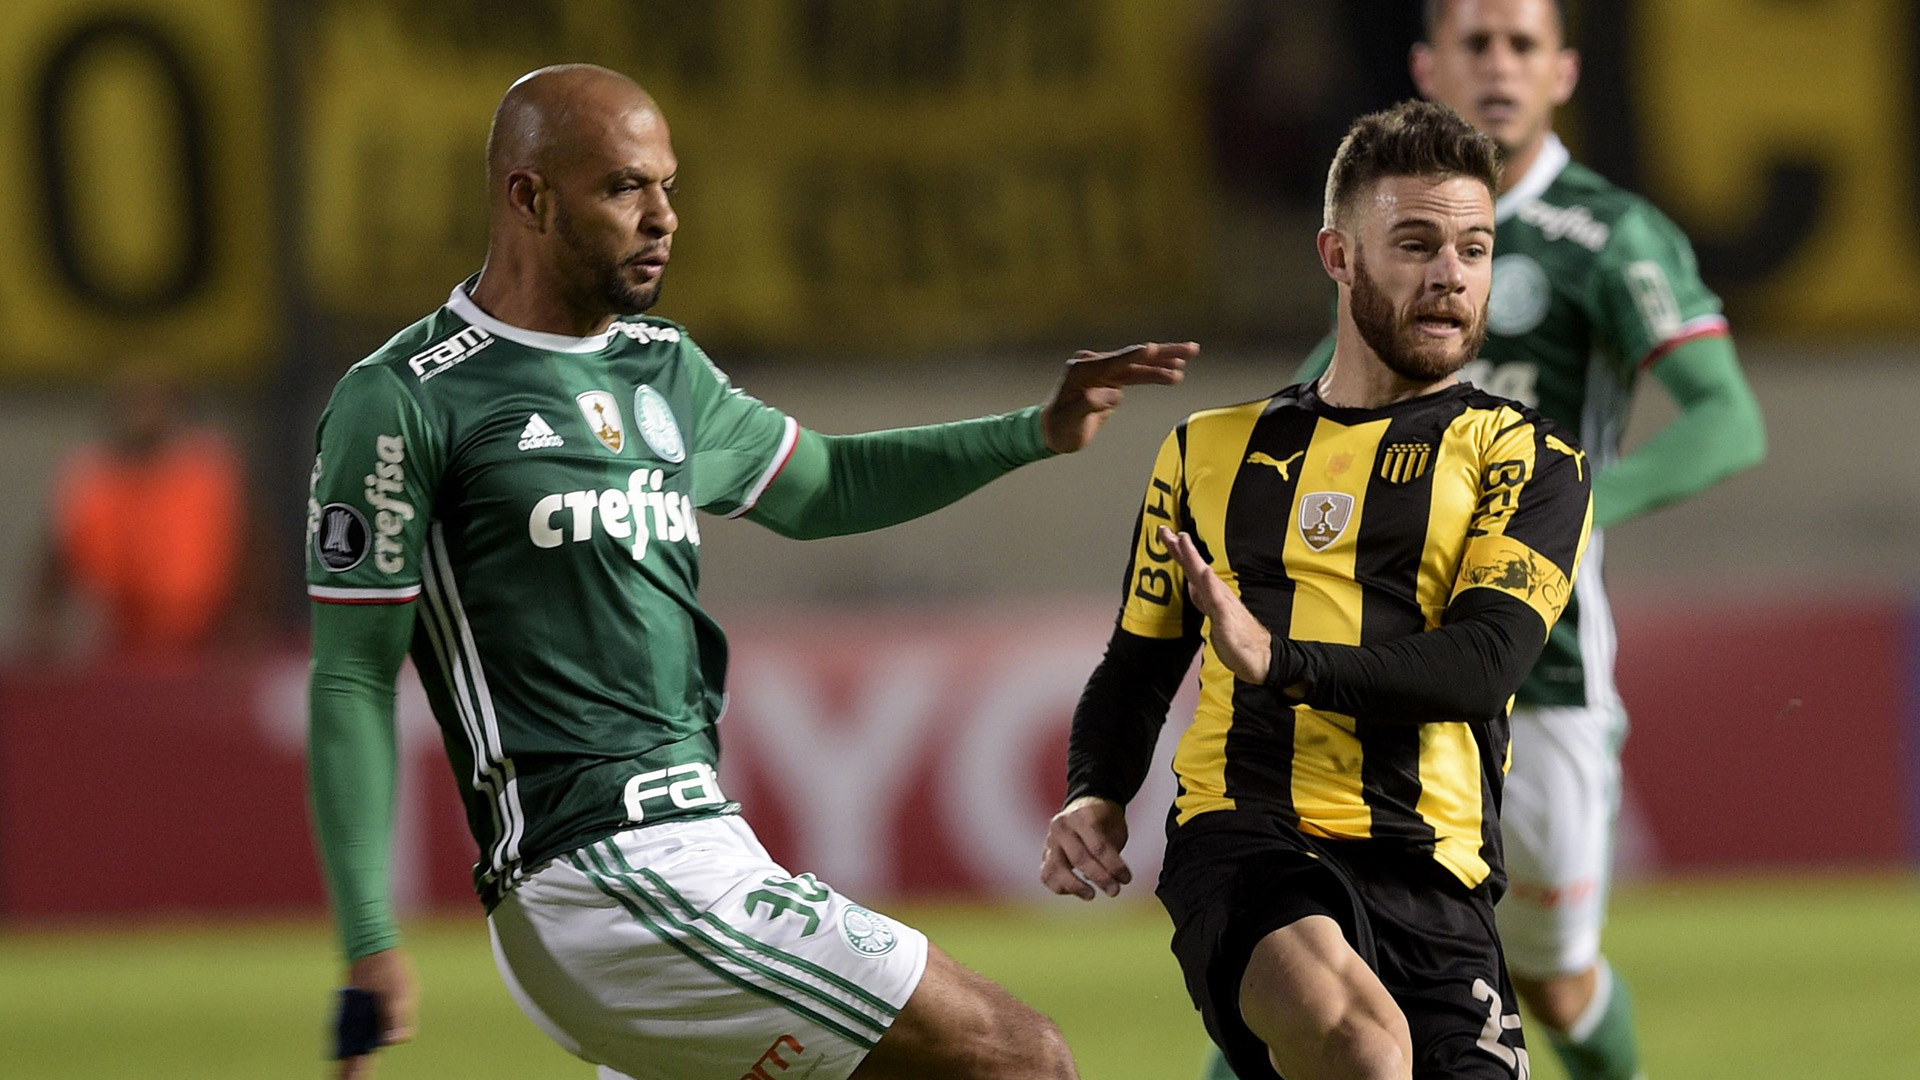 Coppa Libertadores, follia Felipe Melo: pugni a un avversario e maxi rissa